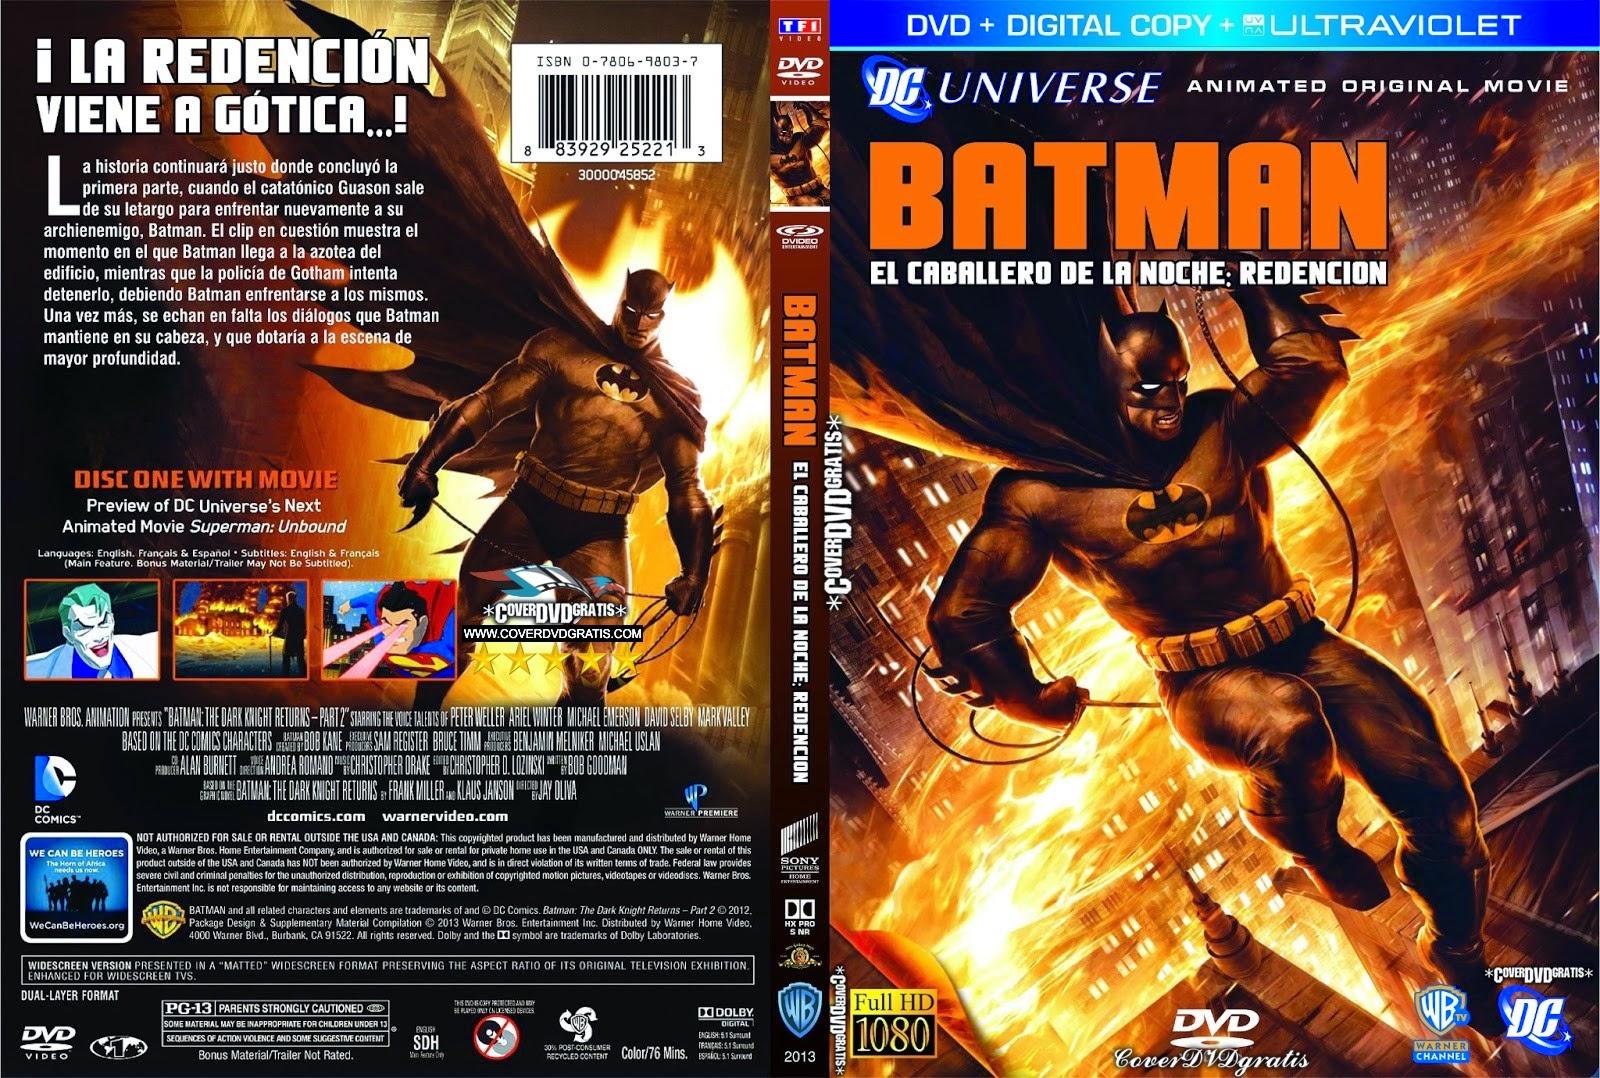 batman the dark knight returns part 2 2013 dvd cover